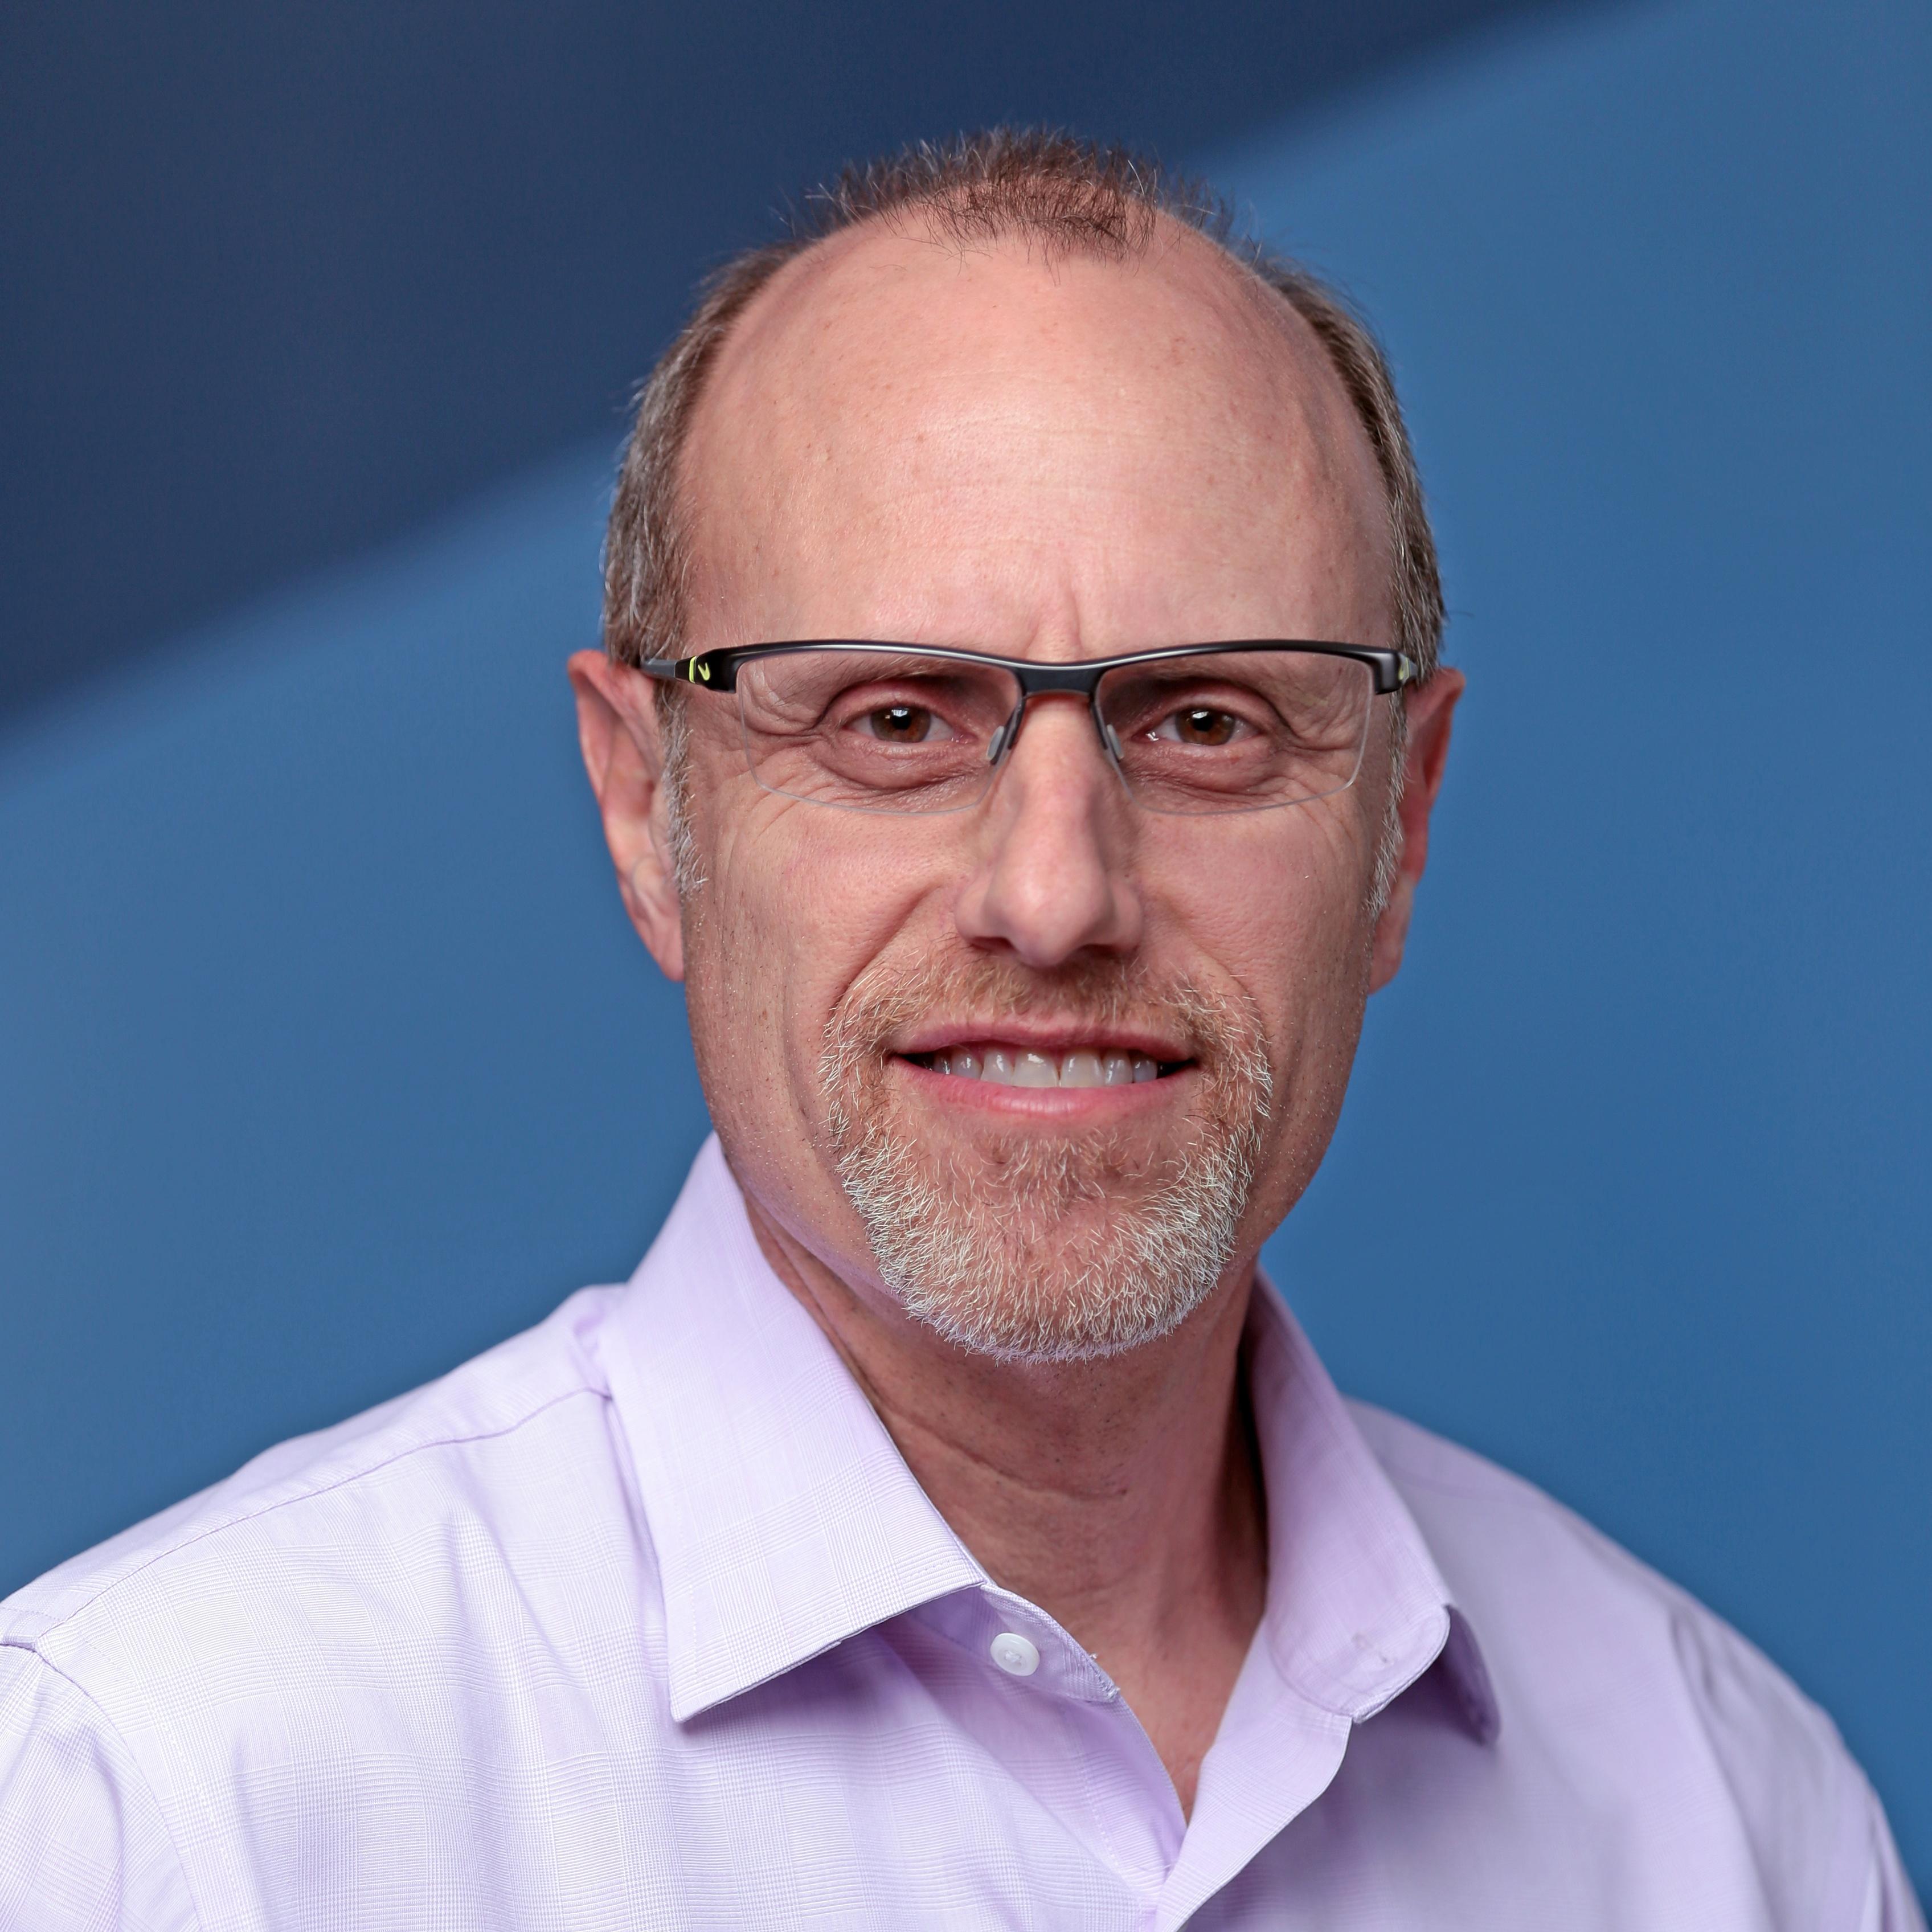 Craig Pollack